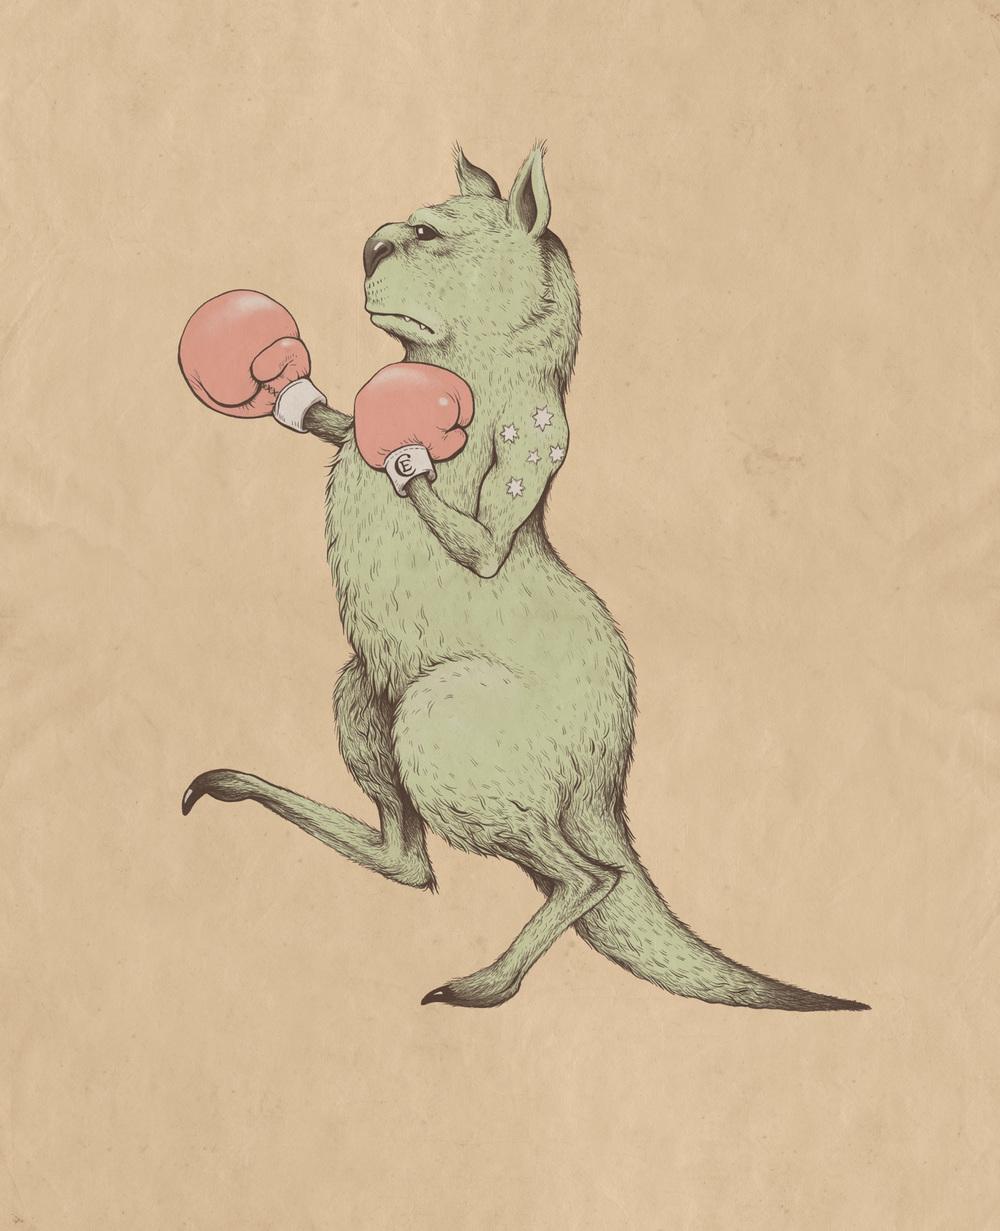 megafauna-boxing-procoptodon-kangaroo.jpg